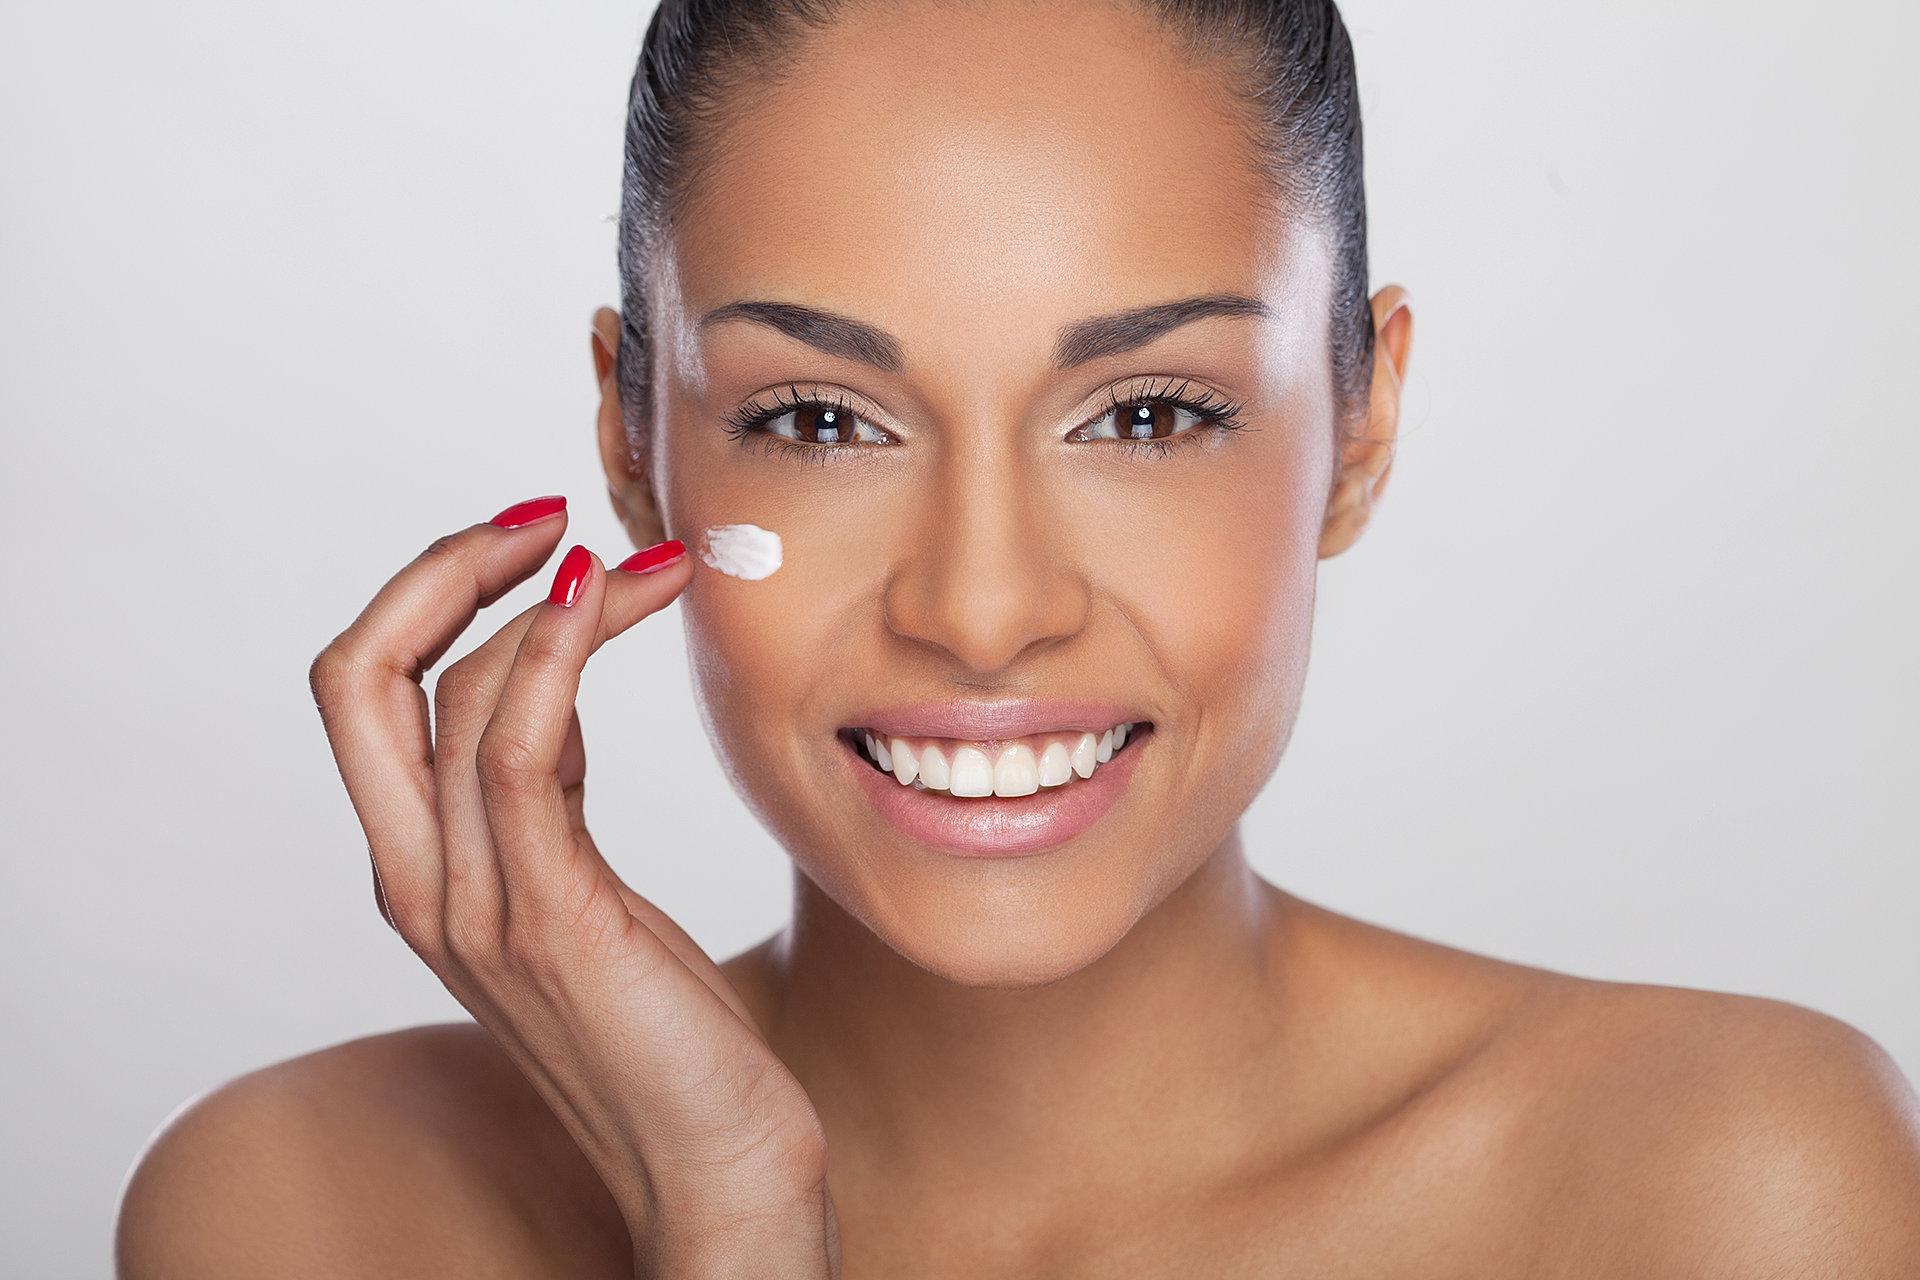 Skin Cleansing faviana cream girl